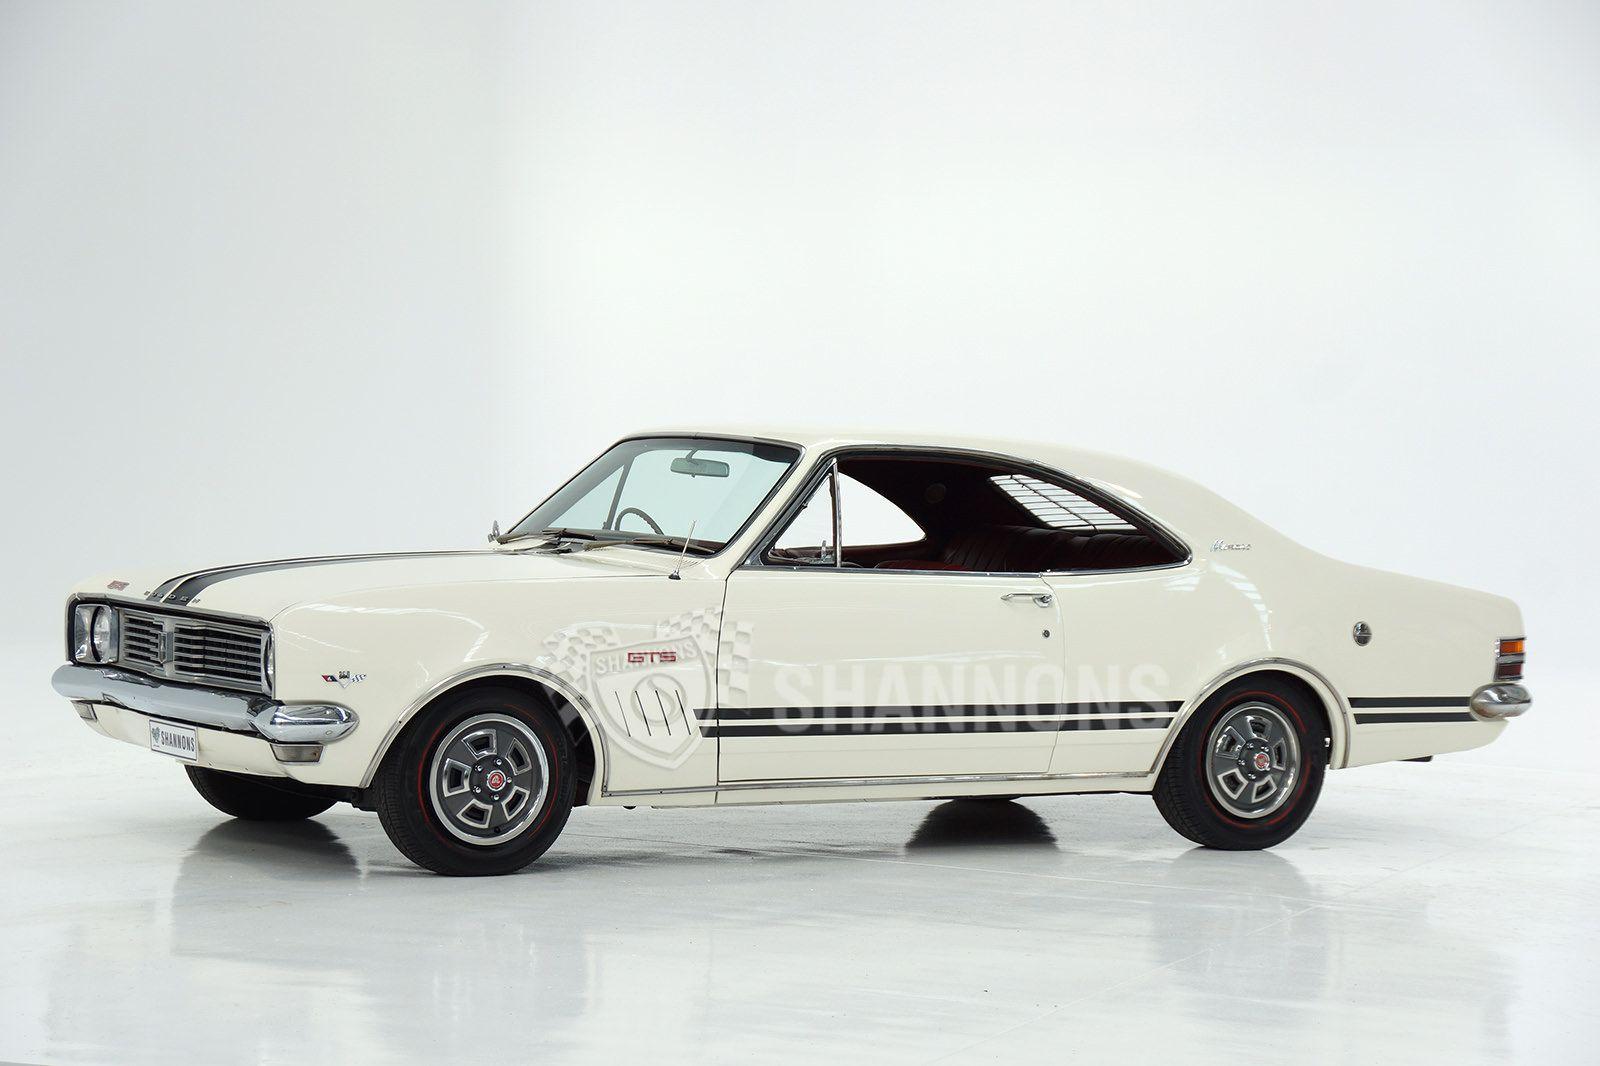 1969 Holden HT Monaro Coupe